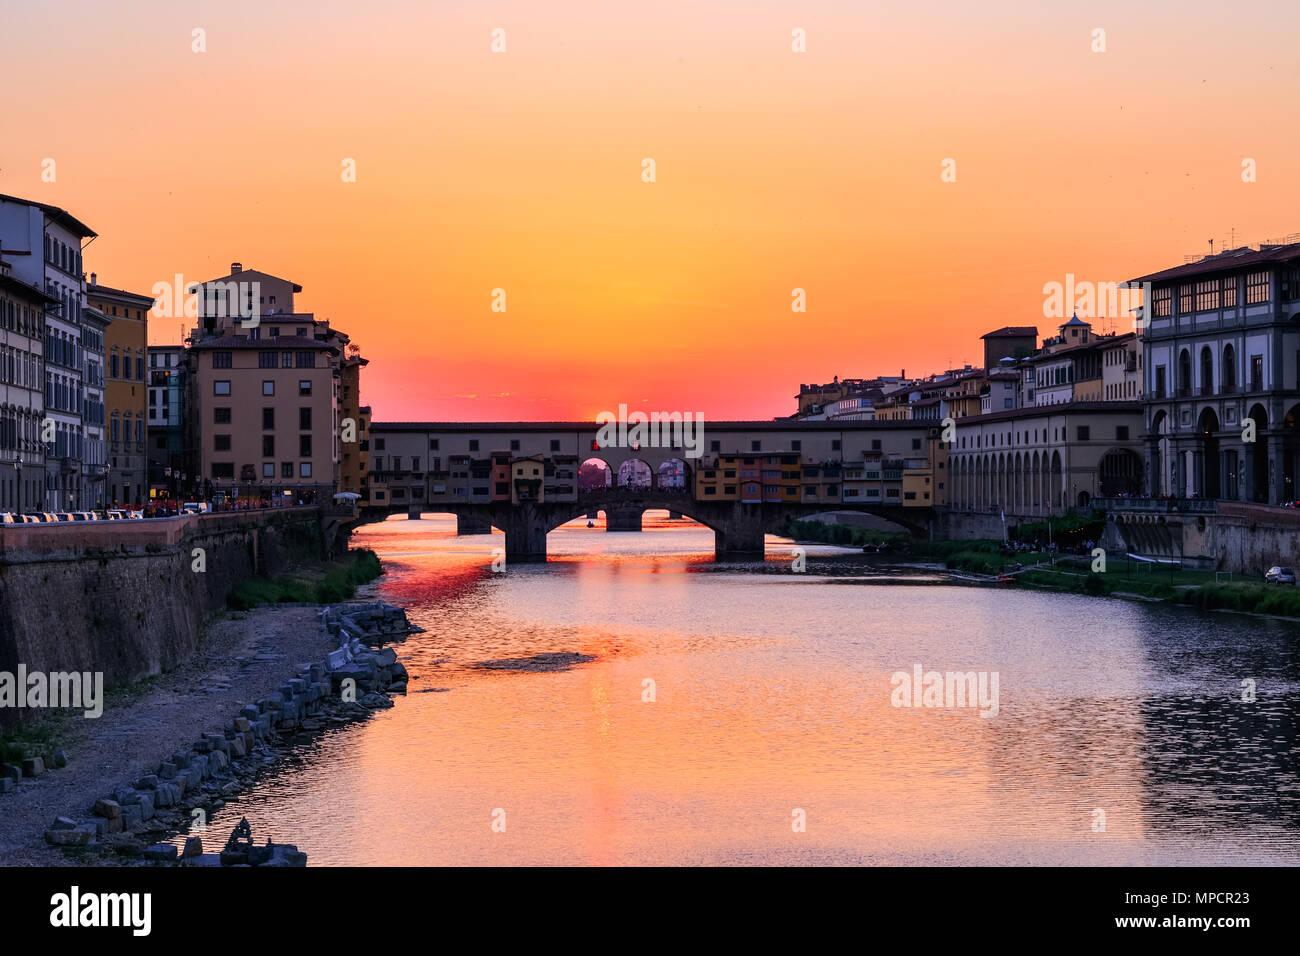 Sonnenuntergang am Ponte Vecchio (Alte Brücke) über den Fluss Arno in Florenz, Italien Stockbild